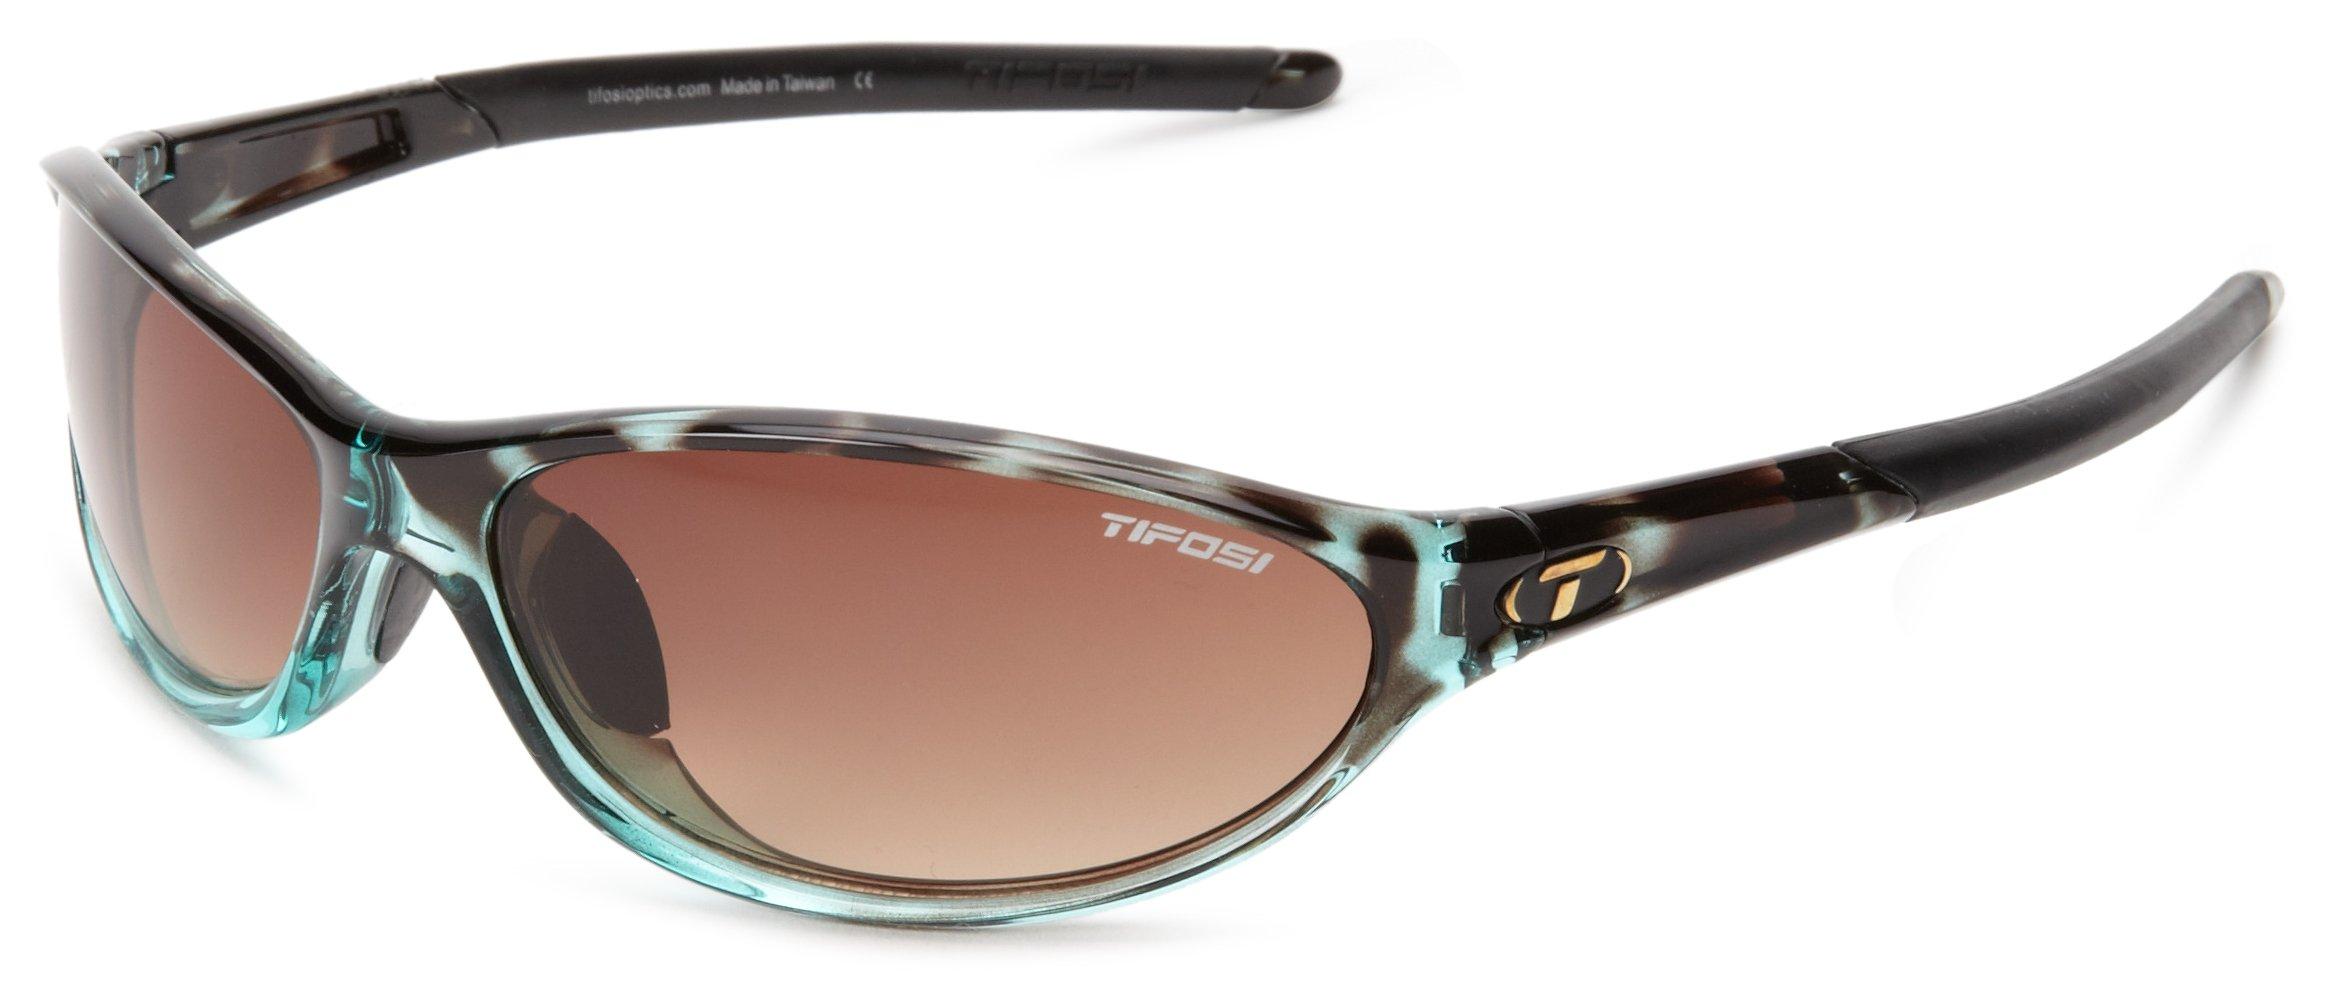 Tifosi womens Alpe 2.0 SingleLens Sunglasses,Blue Tortoise,62 mm